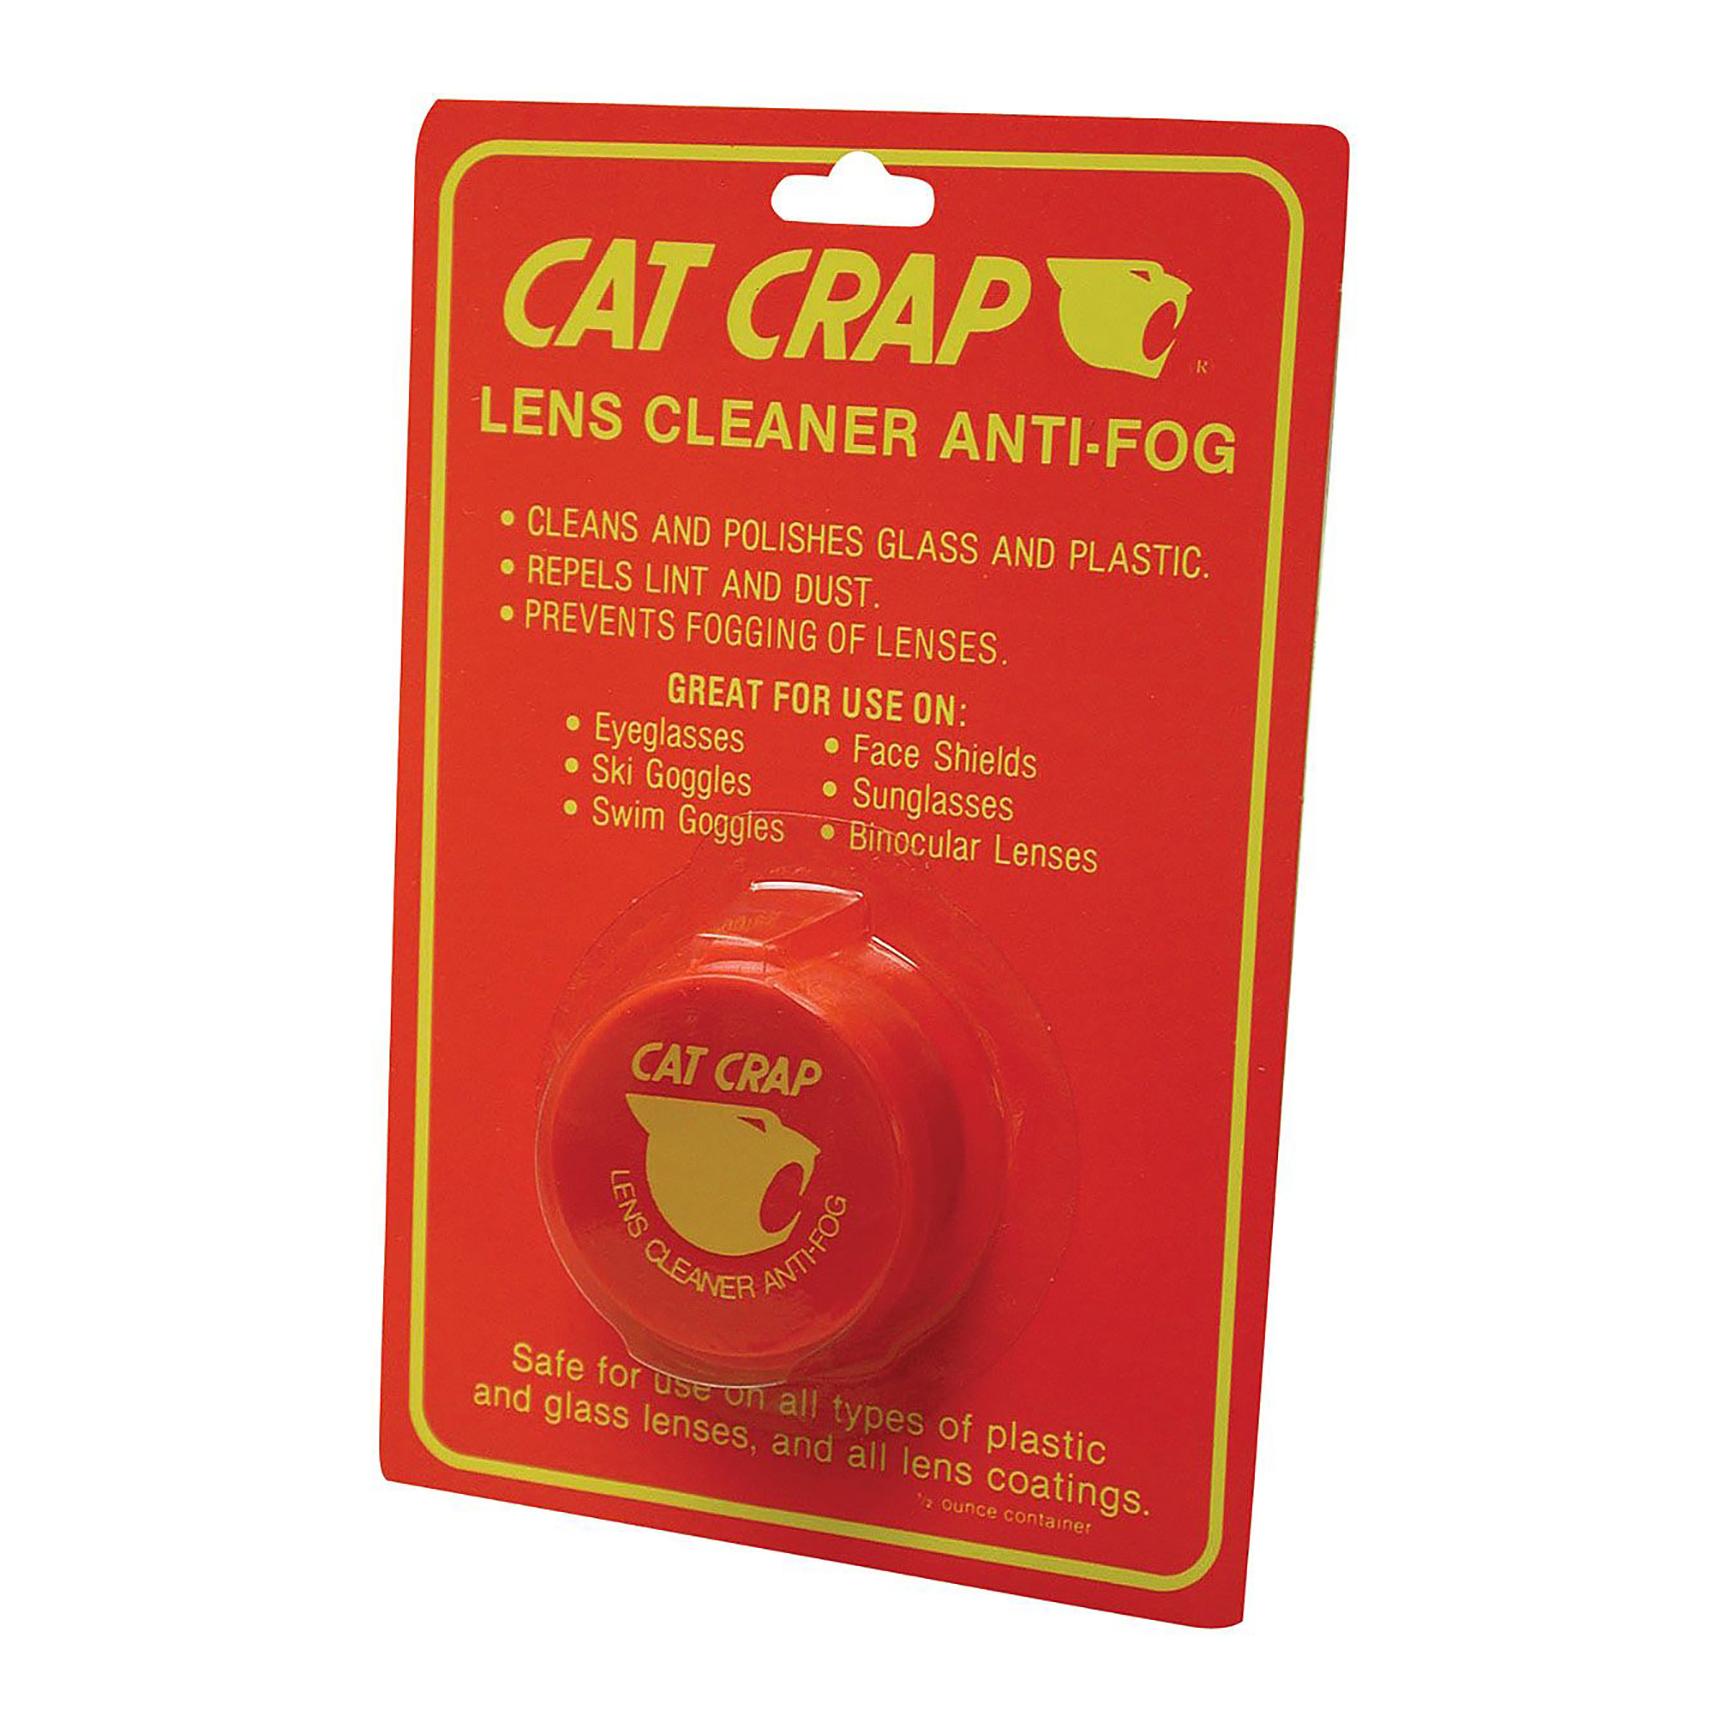 Cat Crap Anti-Fog Blister Pack-1